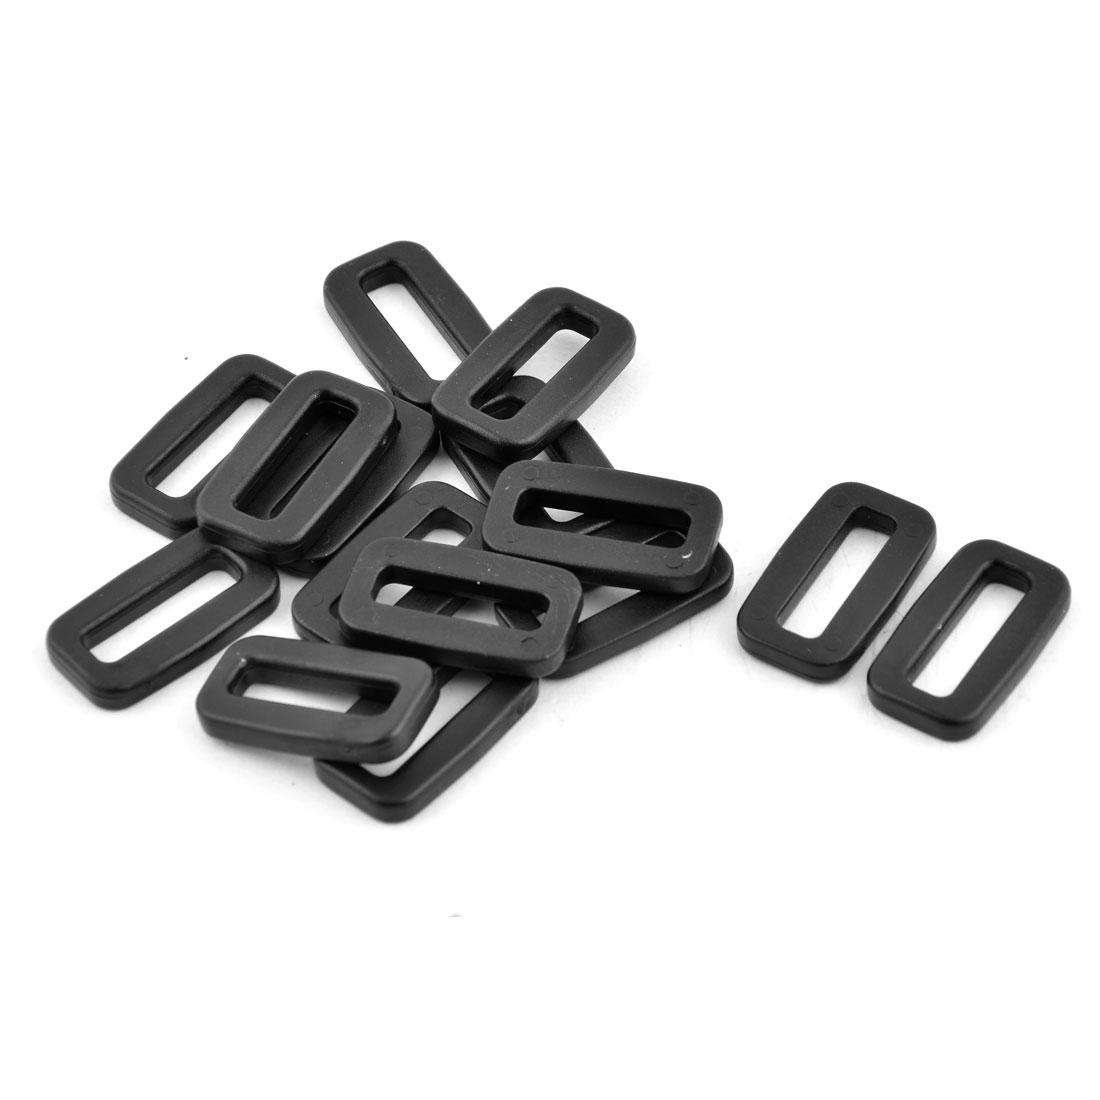 Plastic Schoolbag Belt Tension Fastener Tri Glide Buckles 20mm Strap Width 15pcs